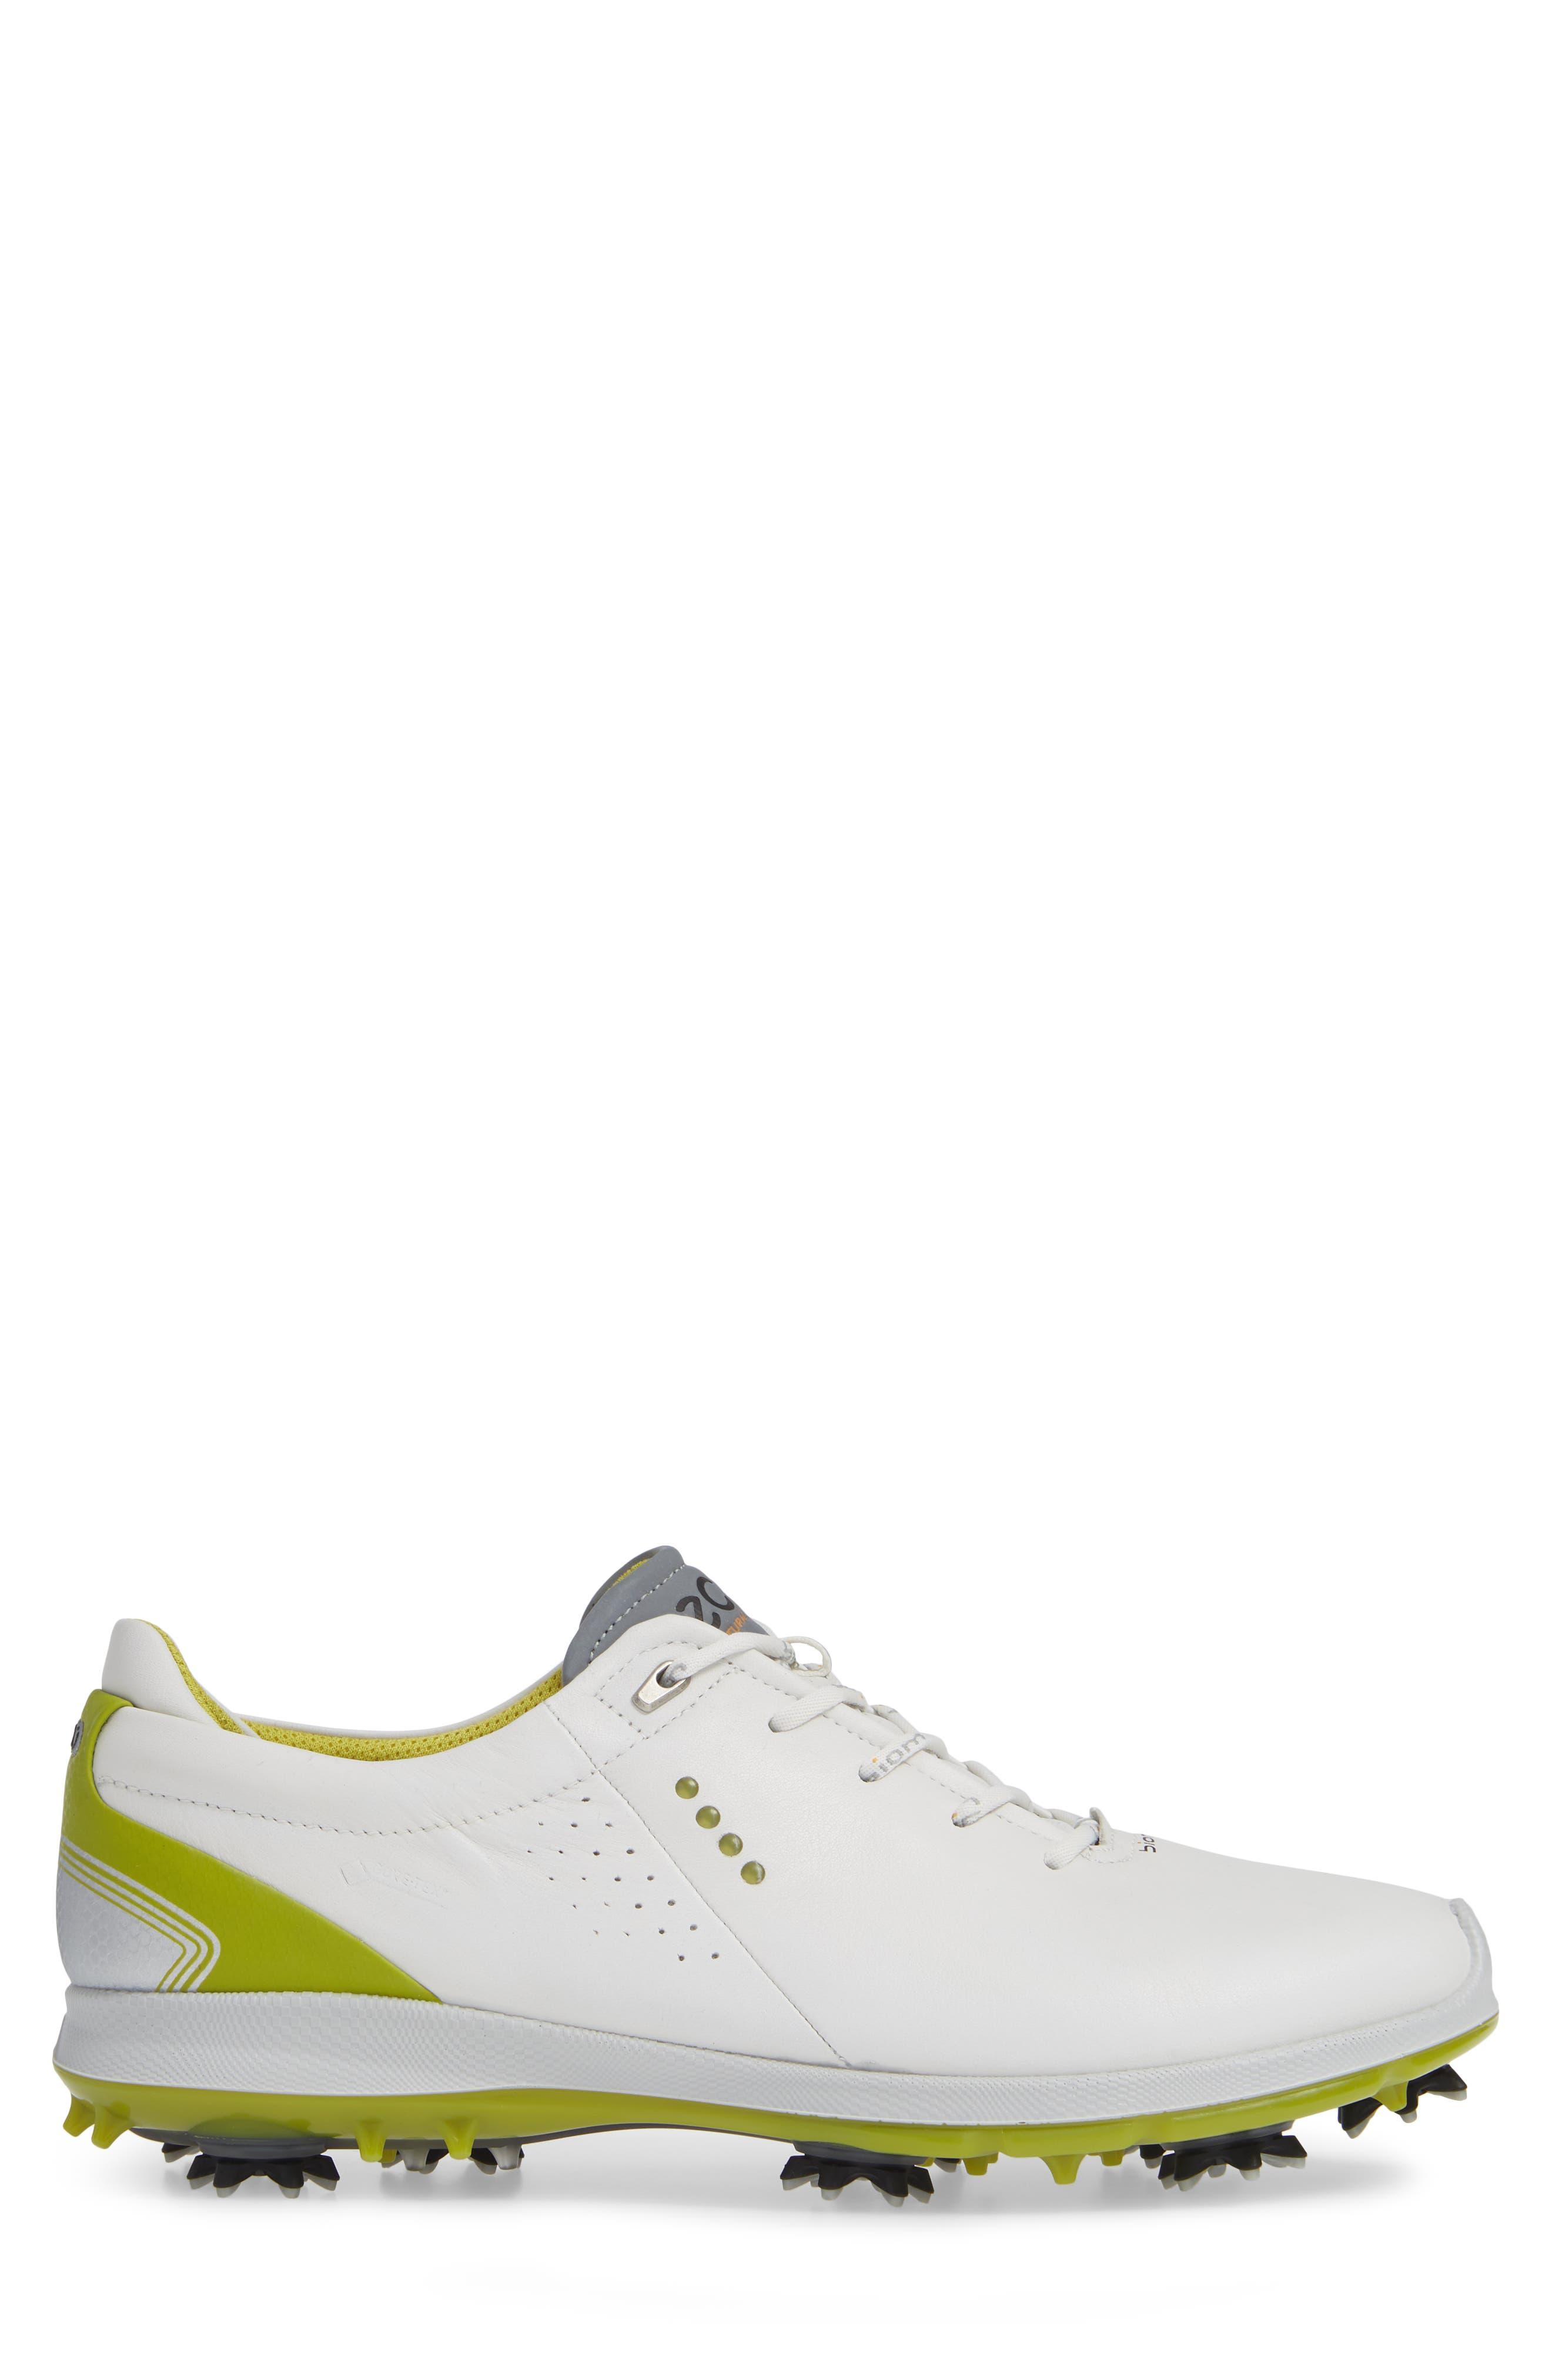 BIOM G 2 Free Gore-Tex<sup>®</sup> Golf Shoe,                             Alternate thumbnail 3, color,                             WHITE/ KIWI LEATHER